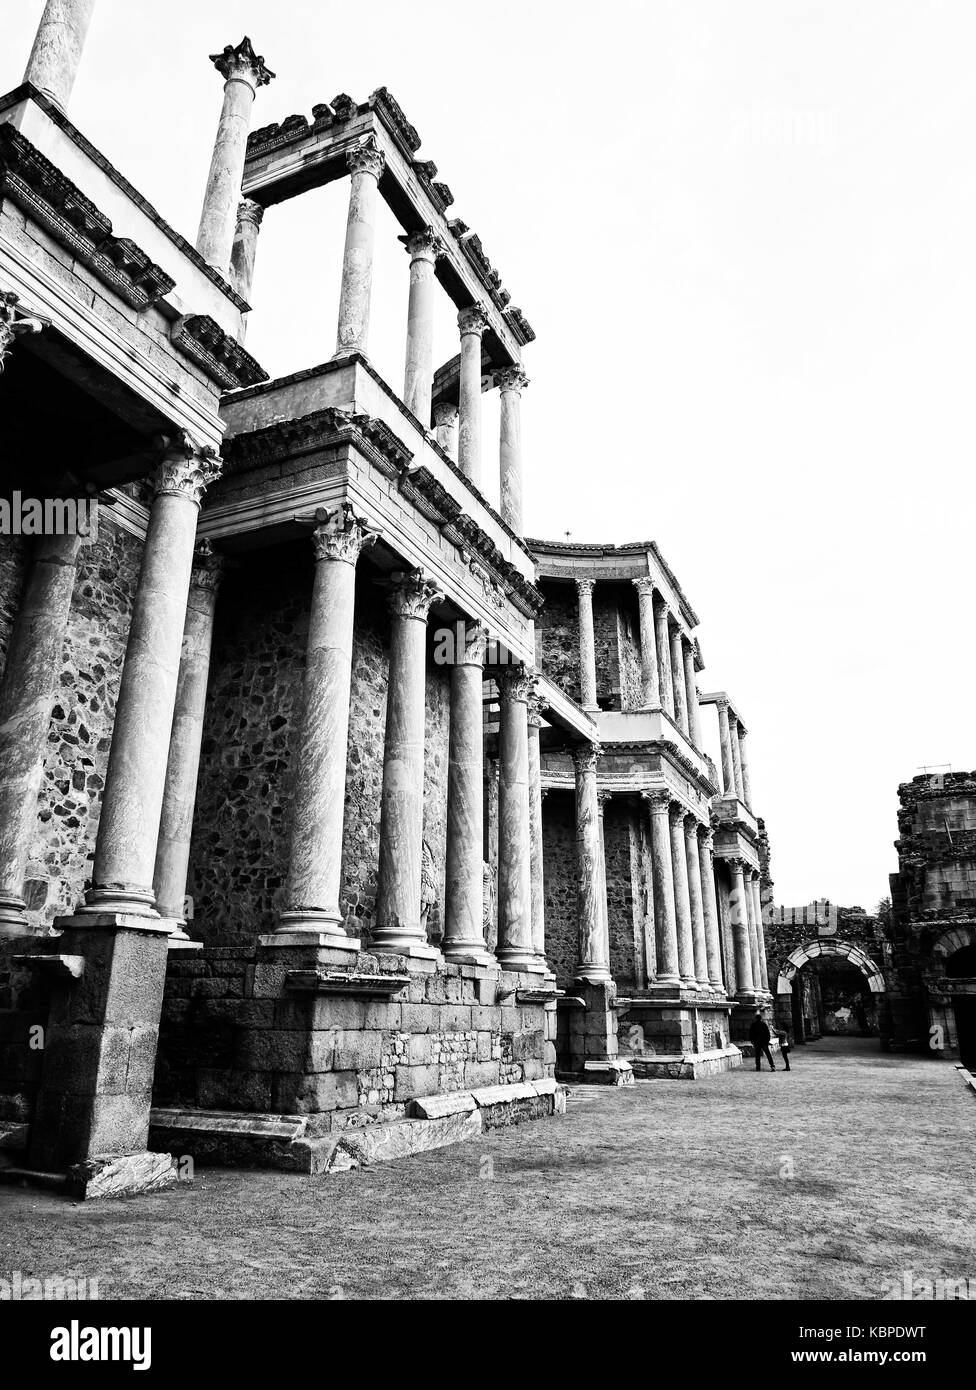 Teatro romano. Mérida. Badajoz. Extremadura. España - Stock Image